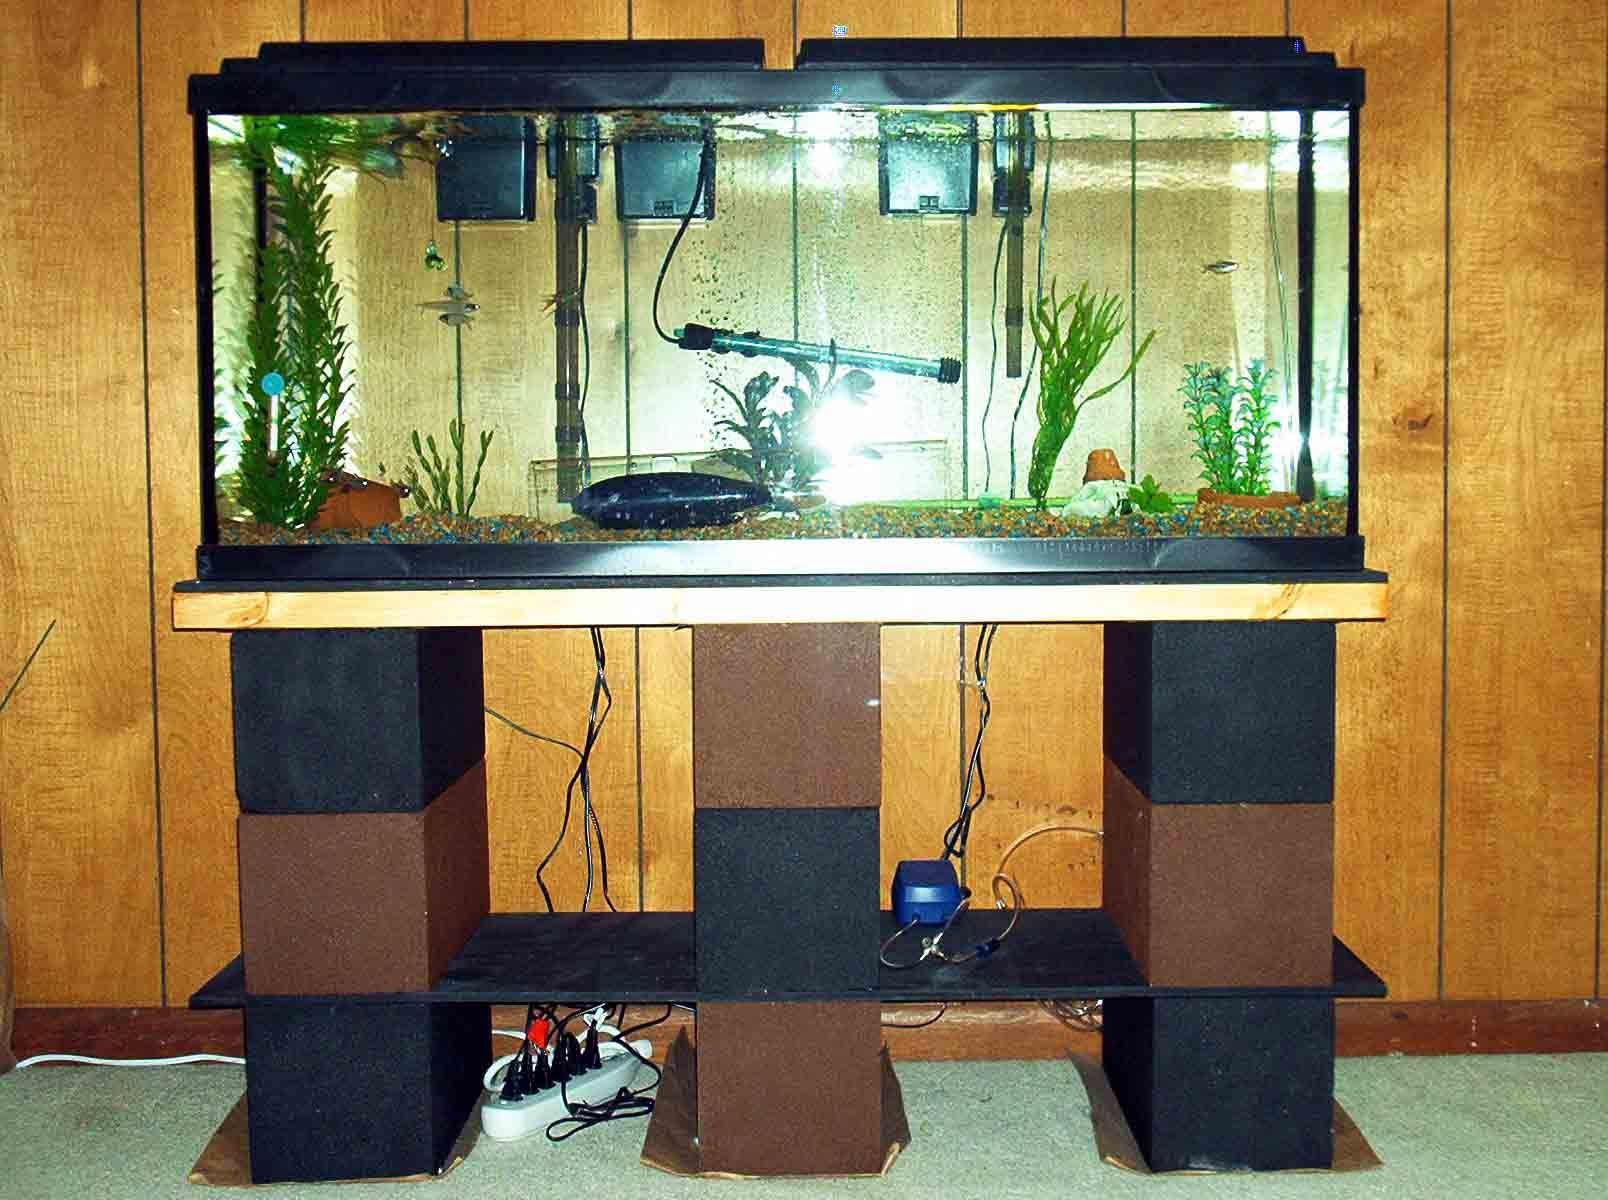 Aquarium fish tank and stand - Build A Strong Inexpensive Aquarium Stand Custom Aquariumstank Standfish